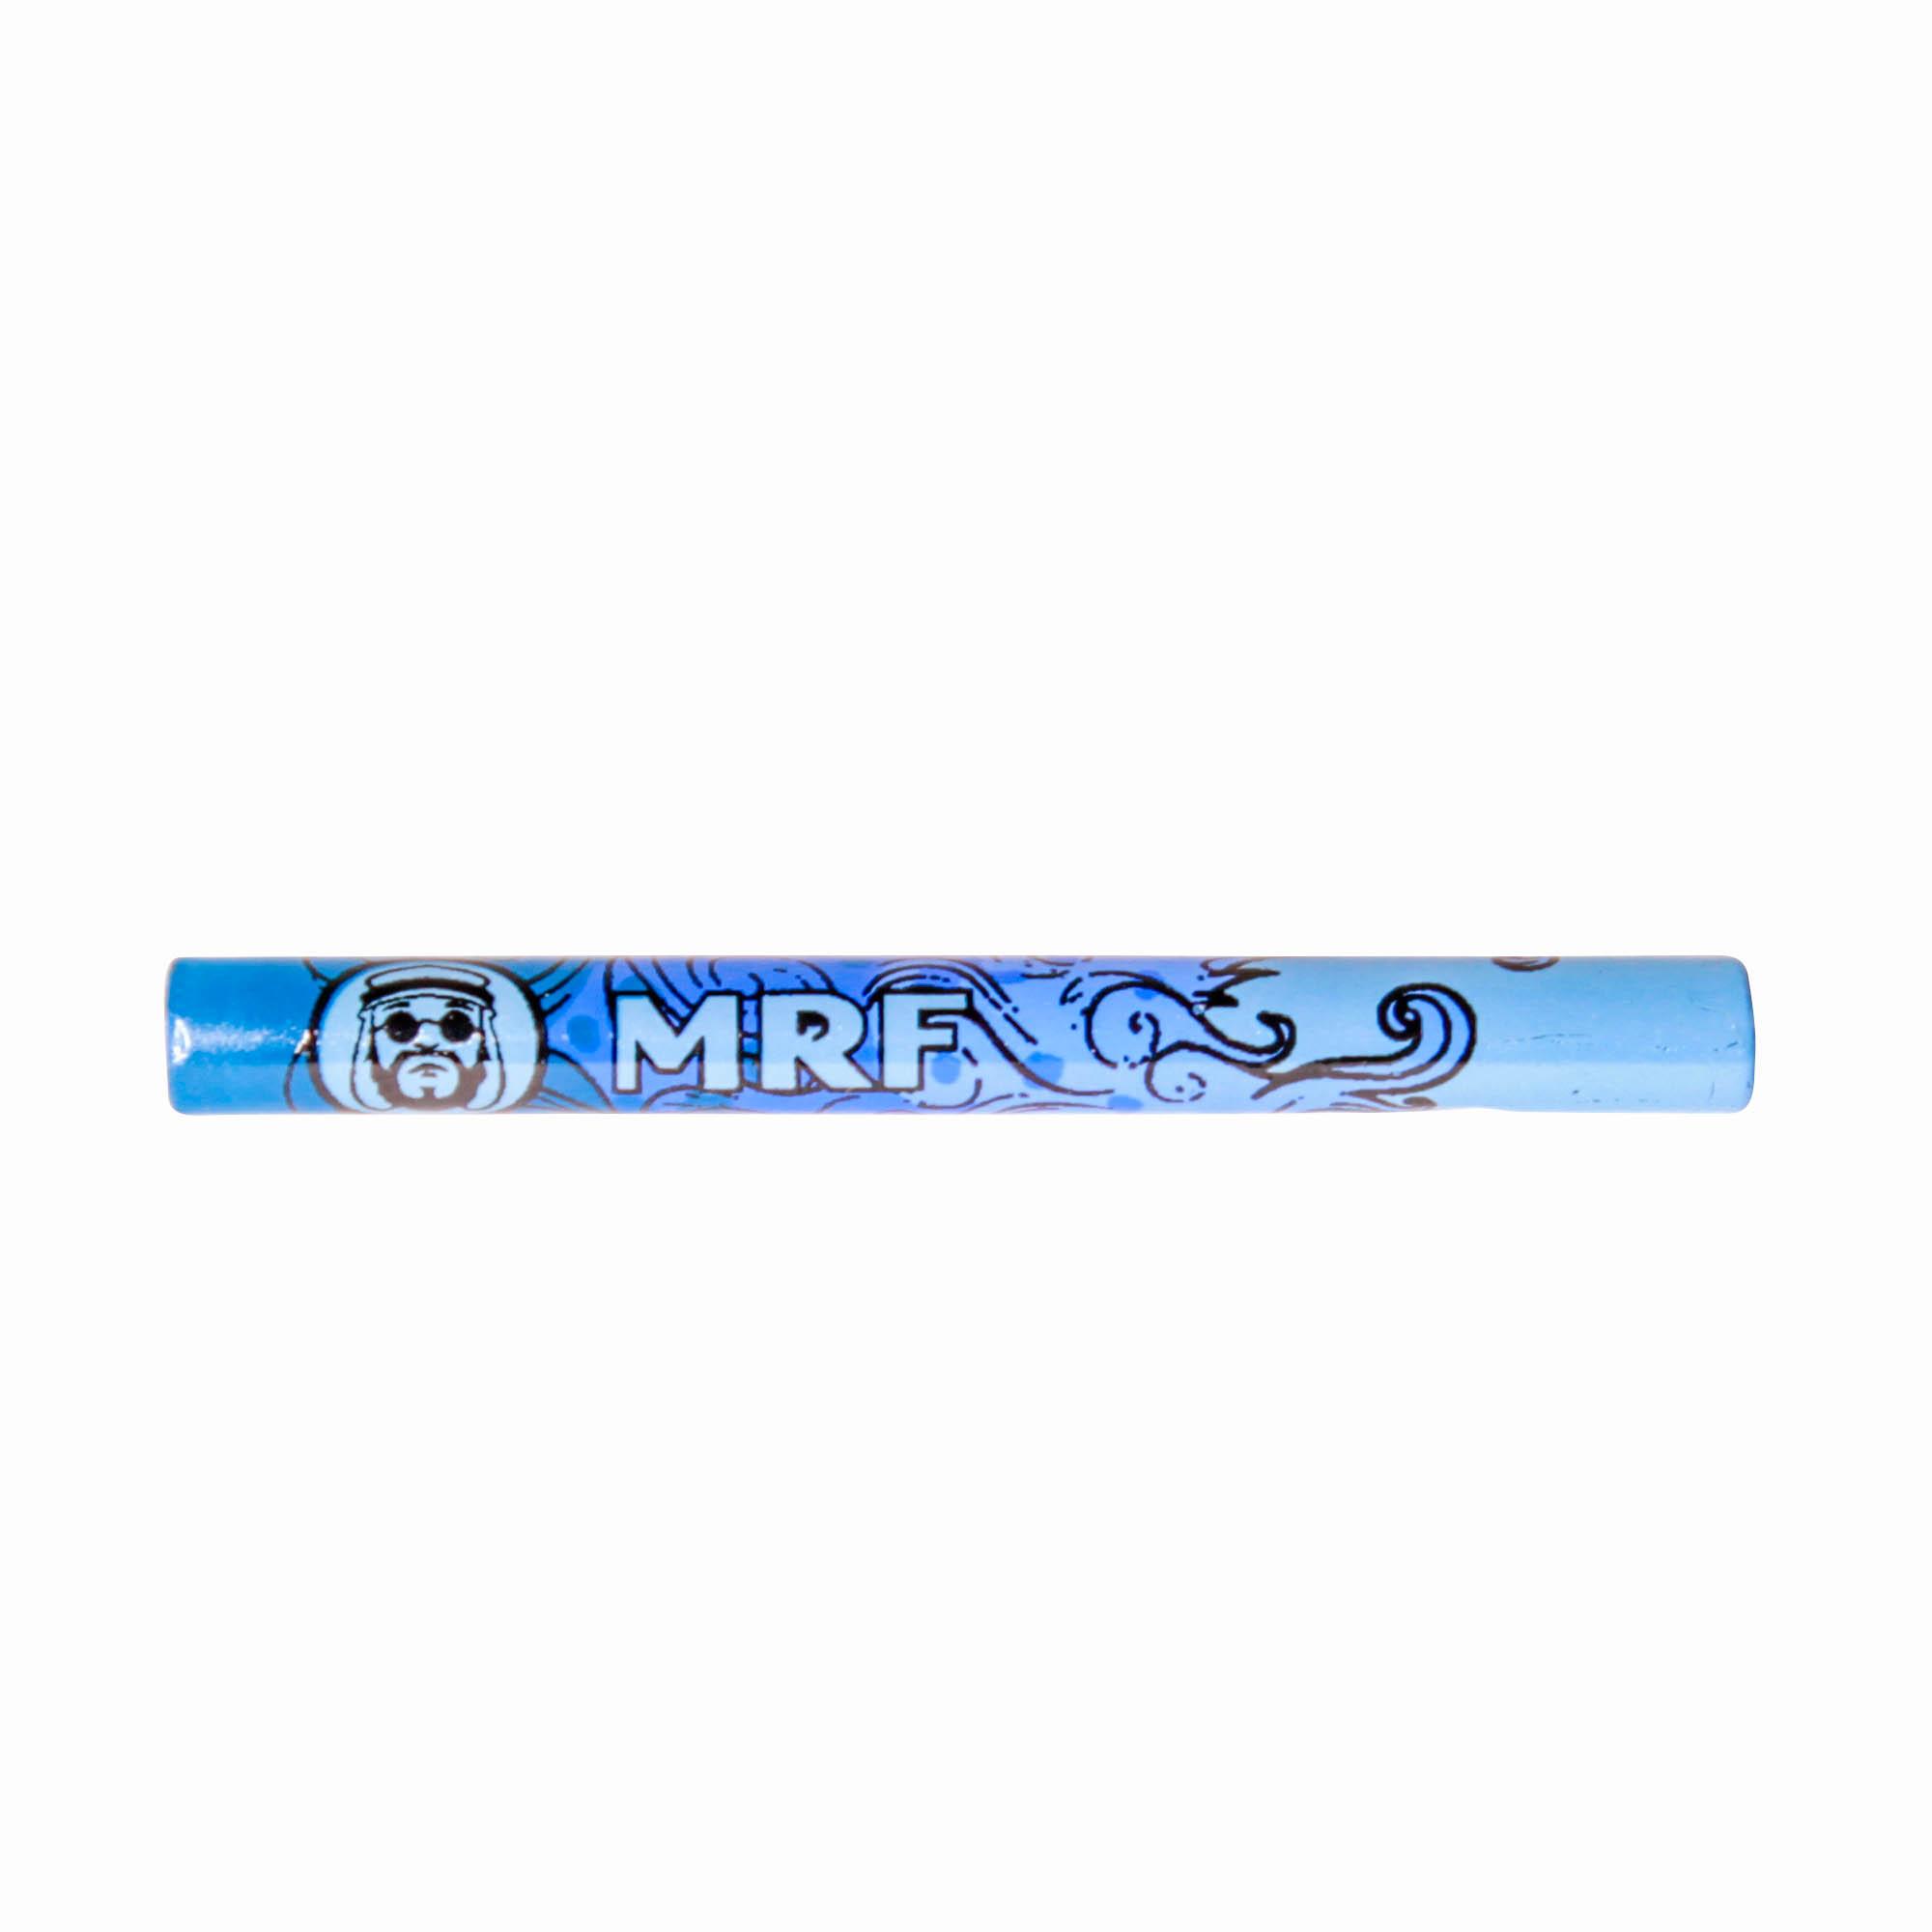 Piteira de Vidro MRF Elements Collection - Água (6 mm)  - Mr. Fumo